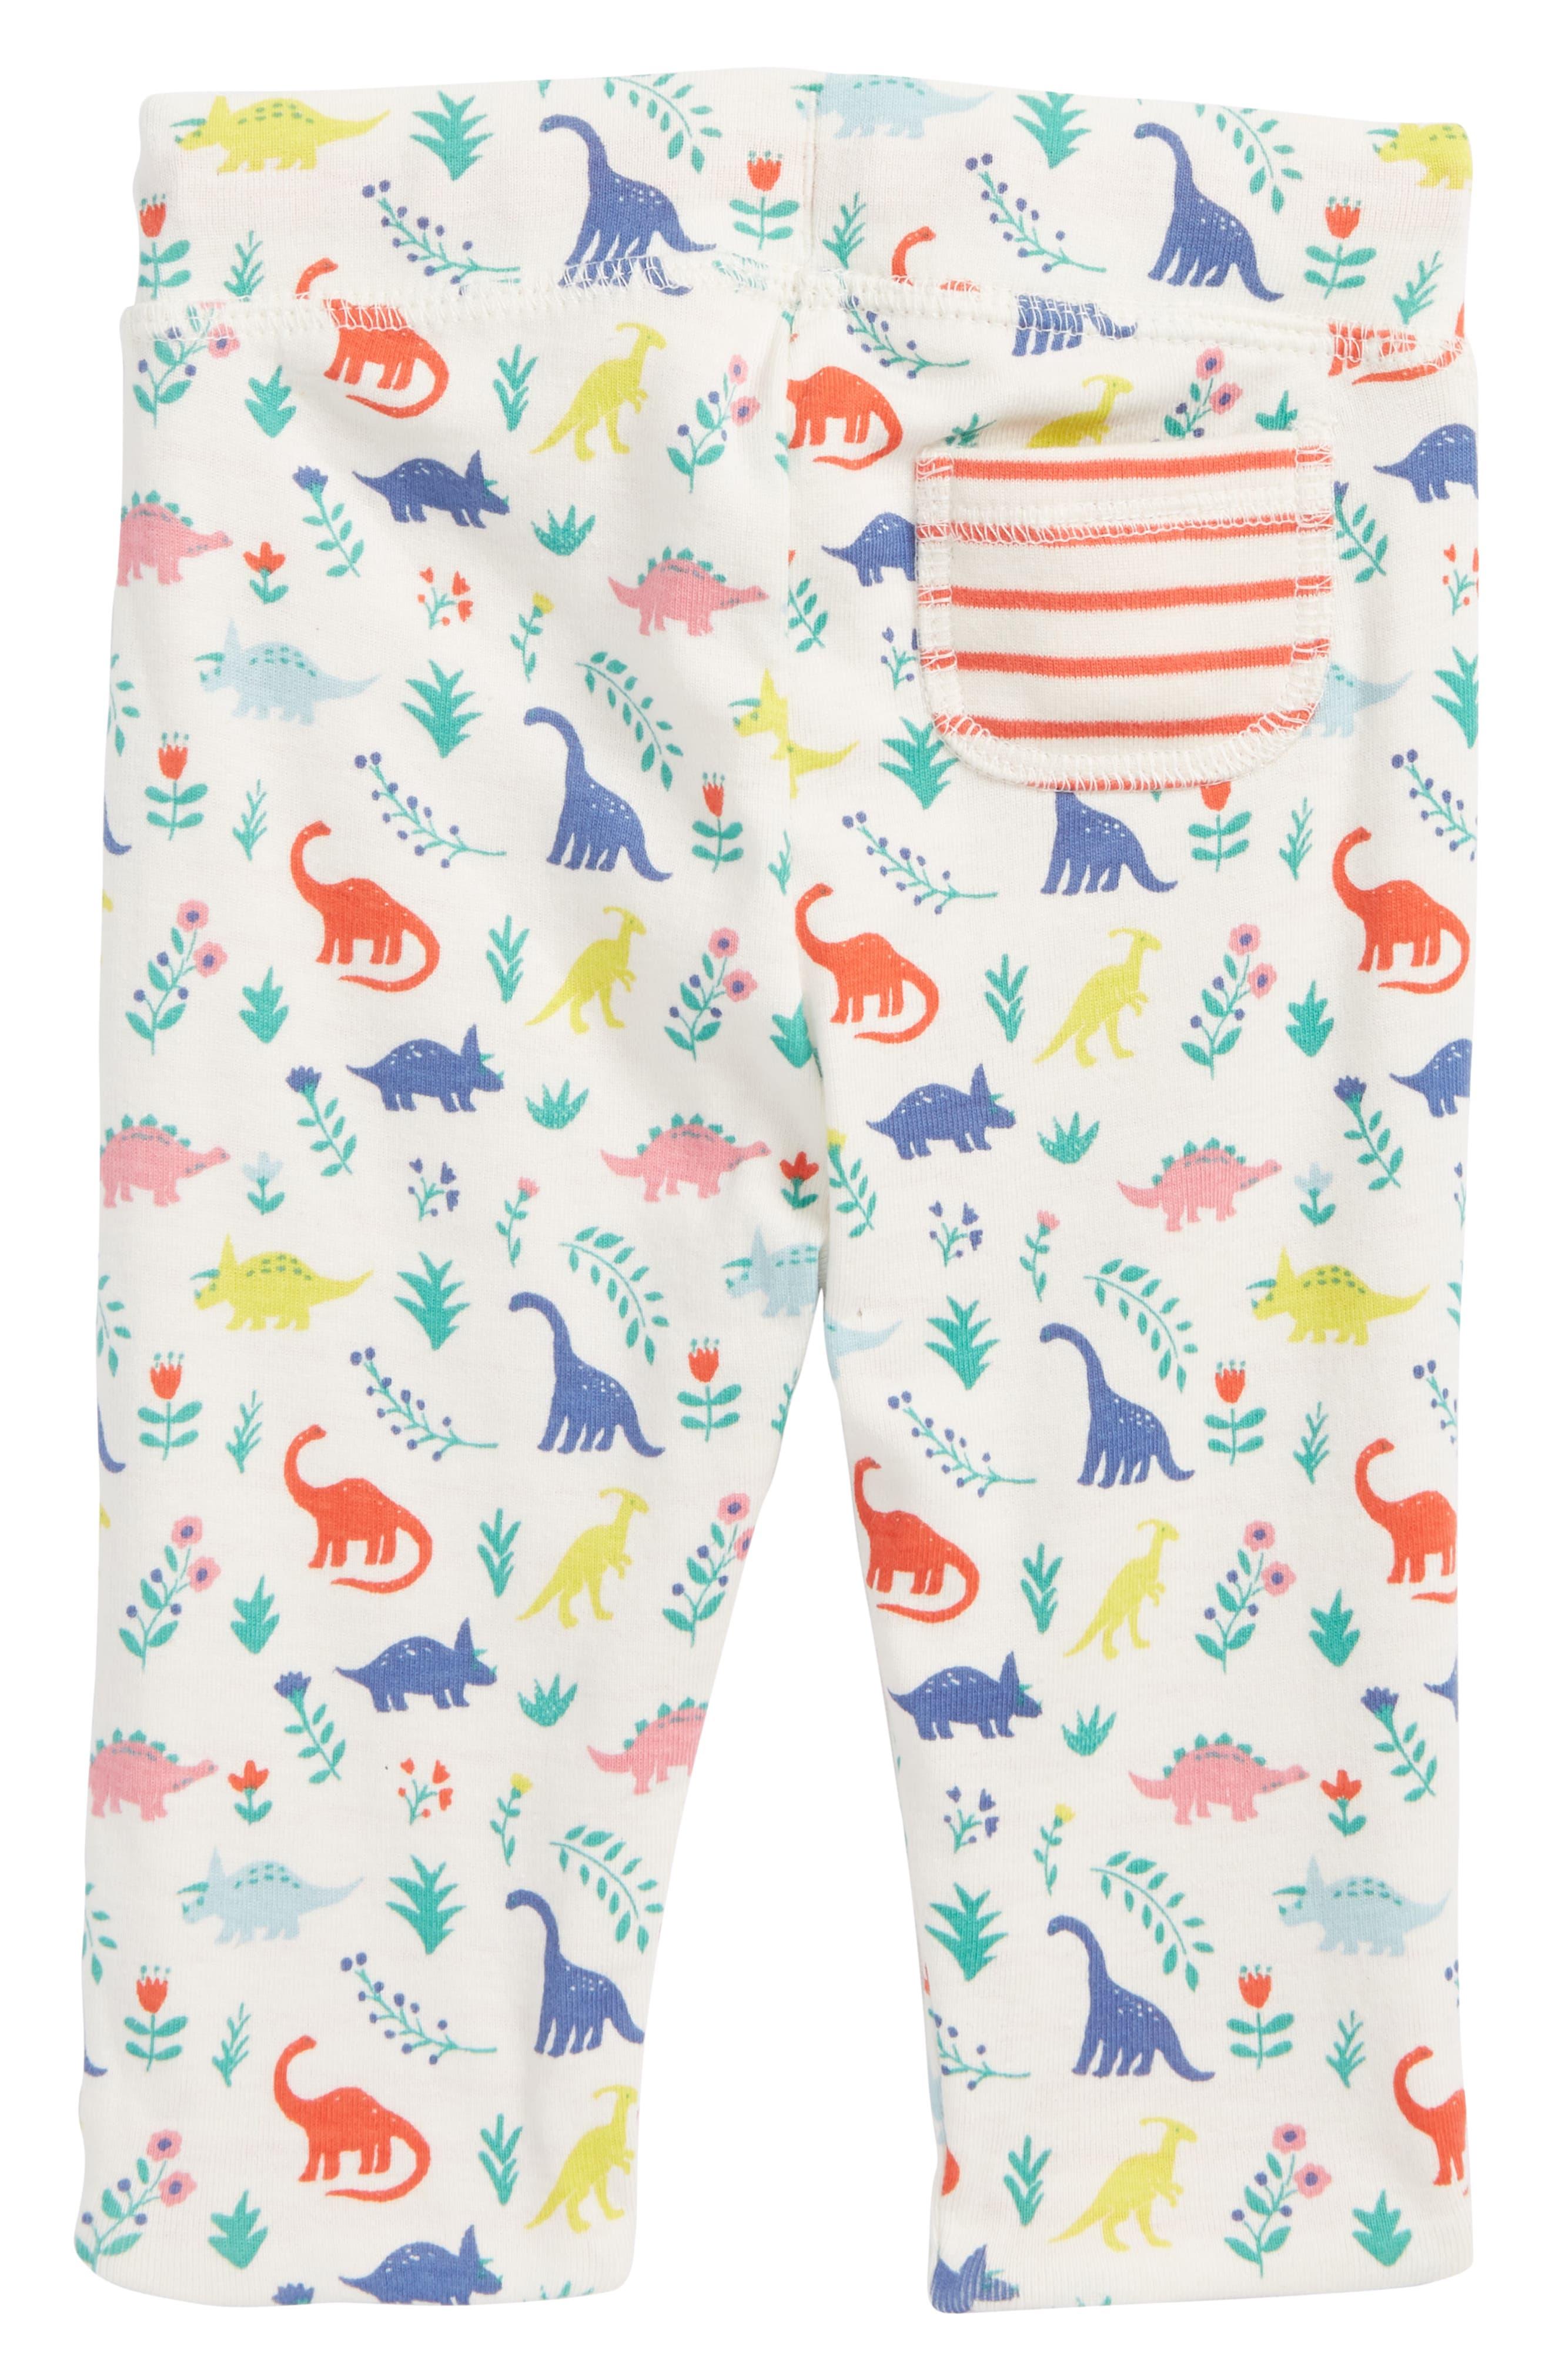 Reversible Print Pants,                             Alternate thumbnail 2, color,                             Multi Dino Floral